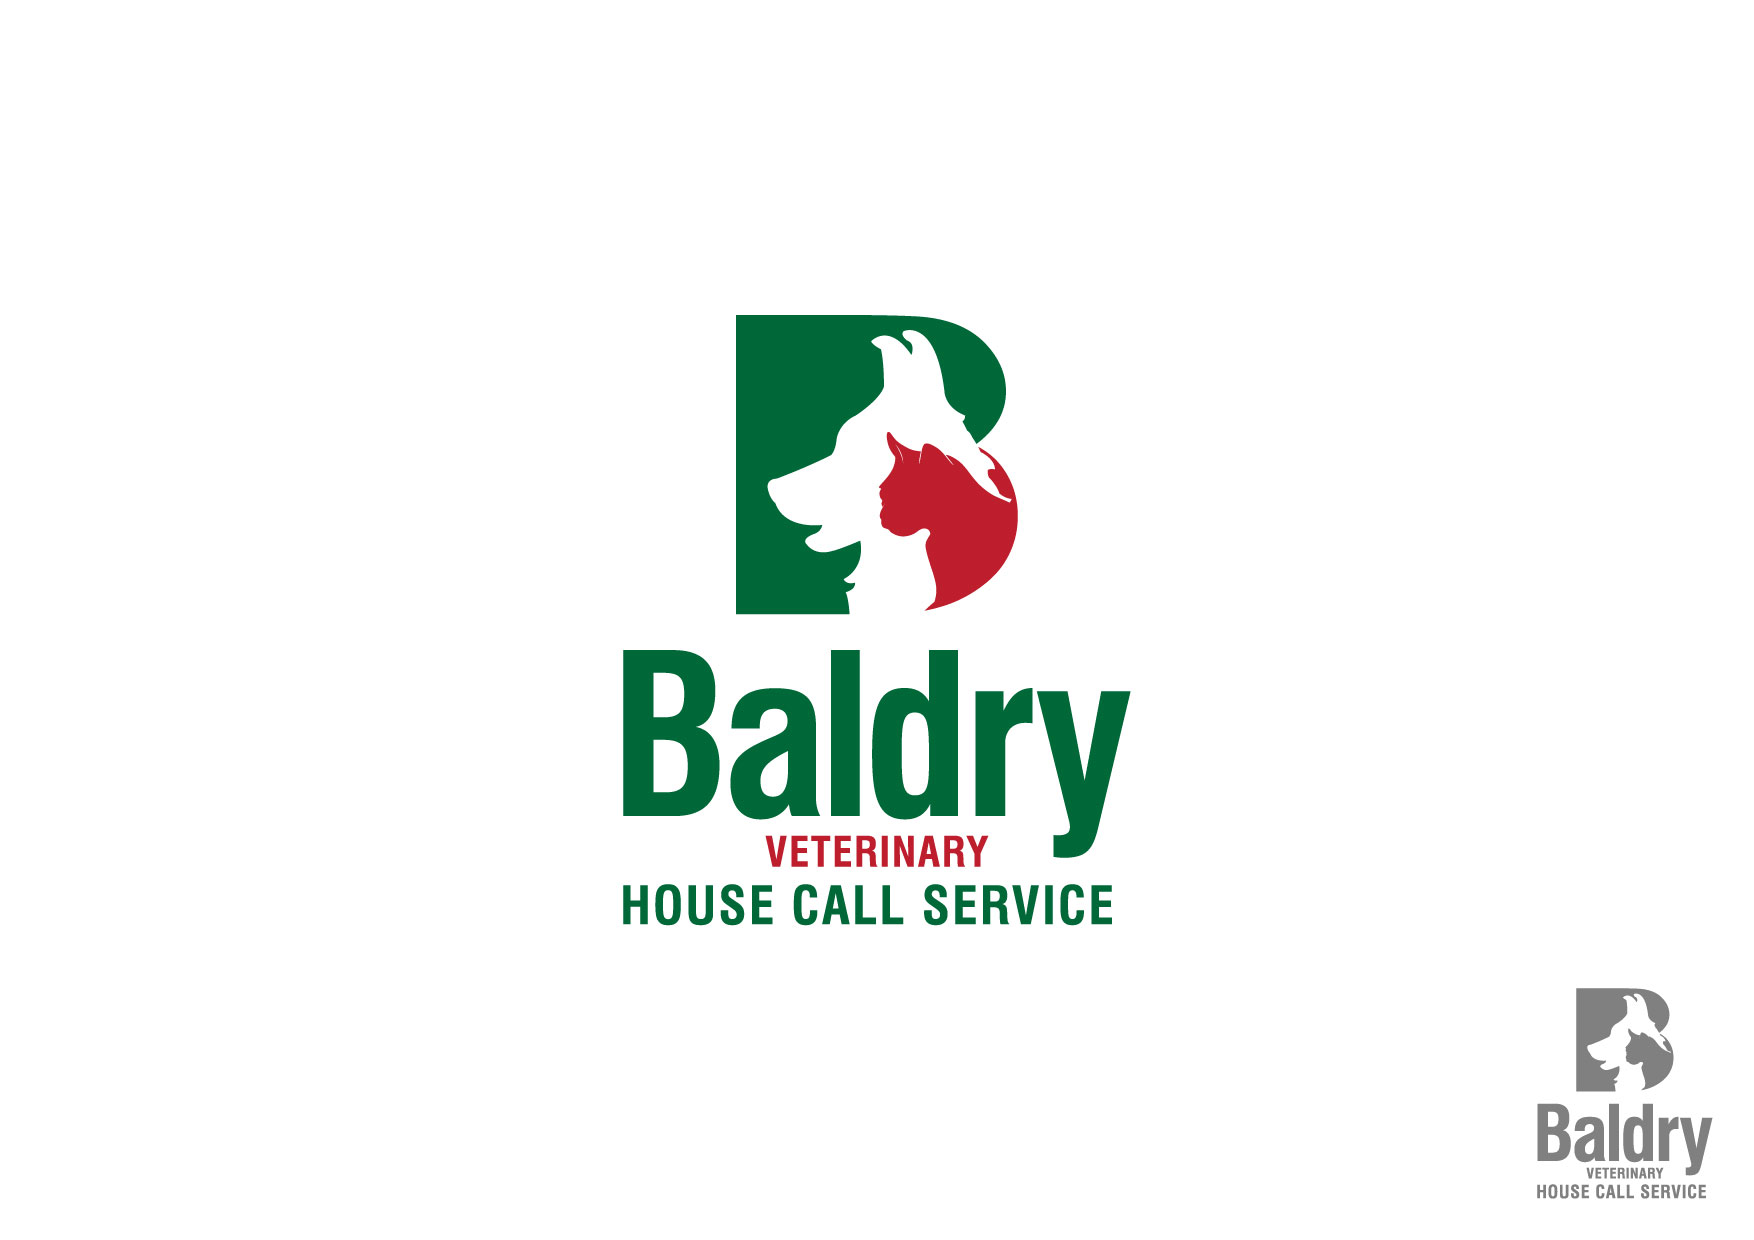 Logo Design by Nurgalih Destianto - Entry No. 36 in the Logo Design Contest Captivating Logo Design for Baldry Veterinary House Call Service.